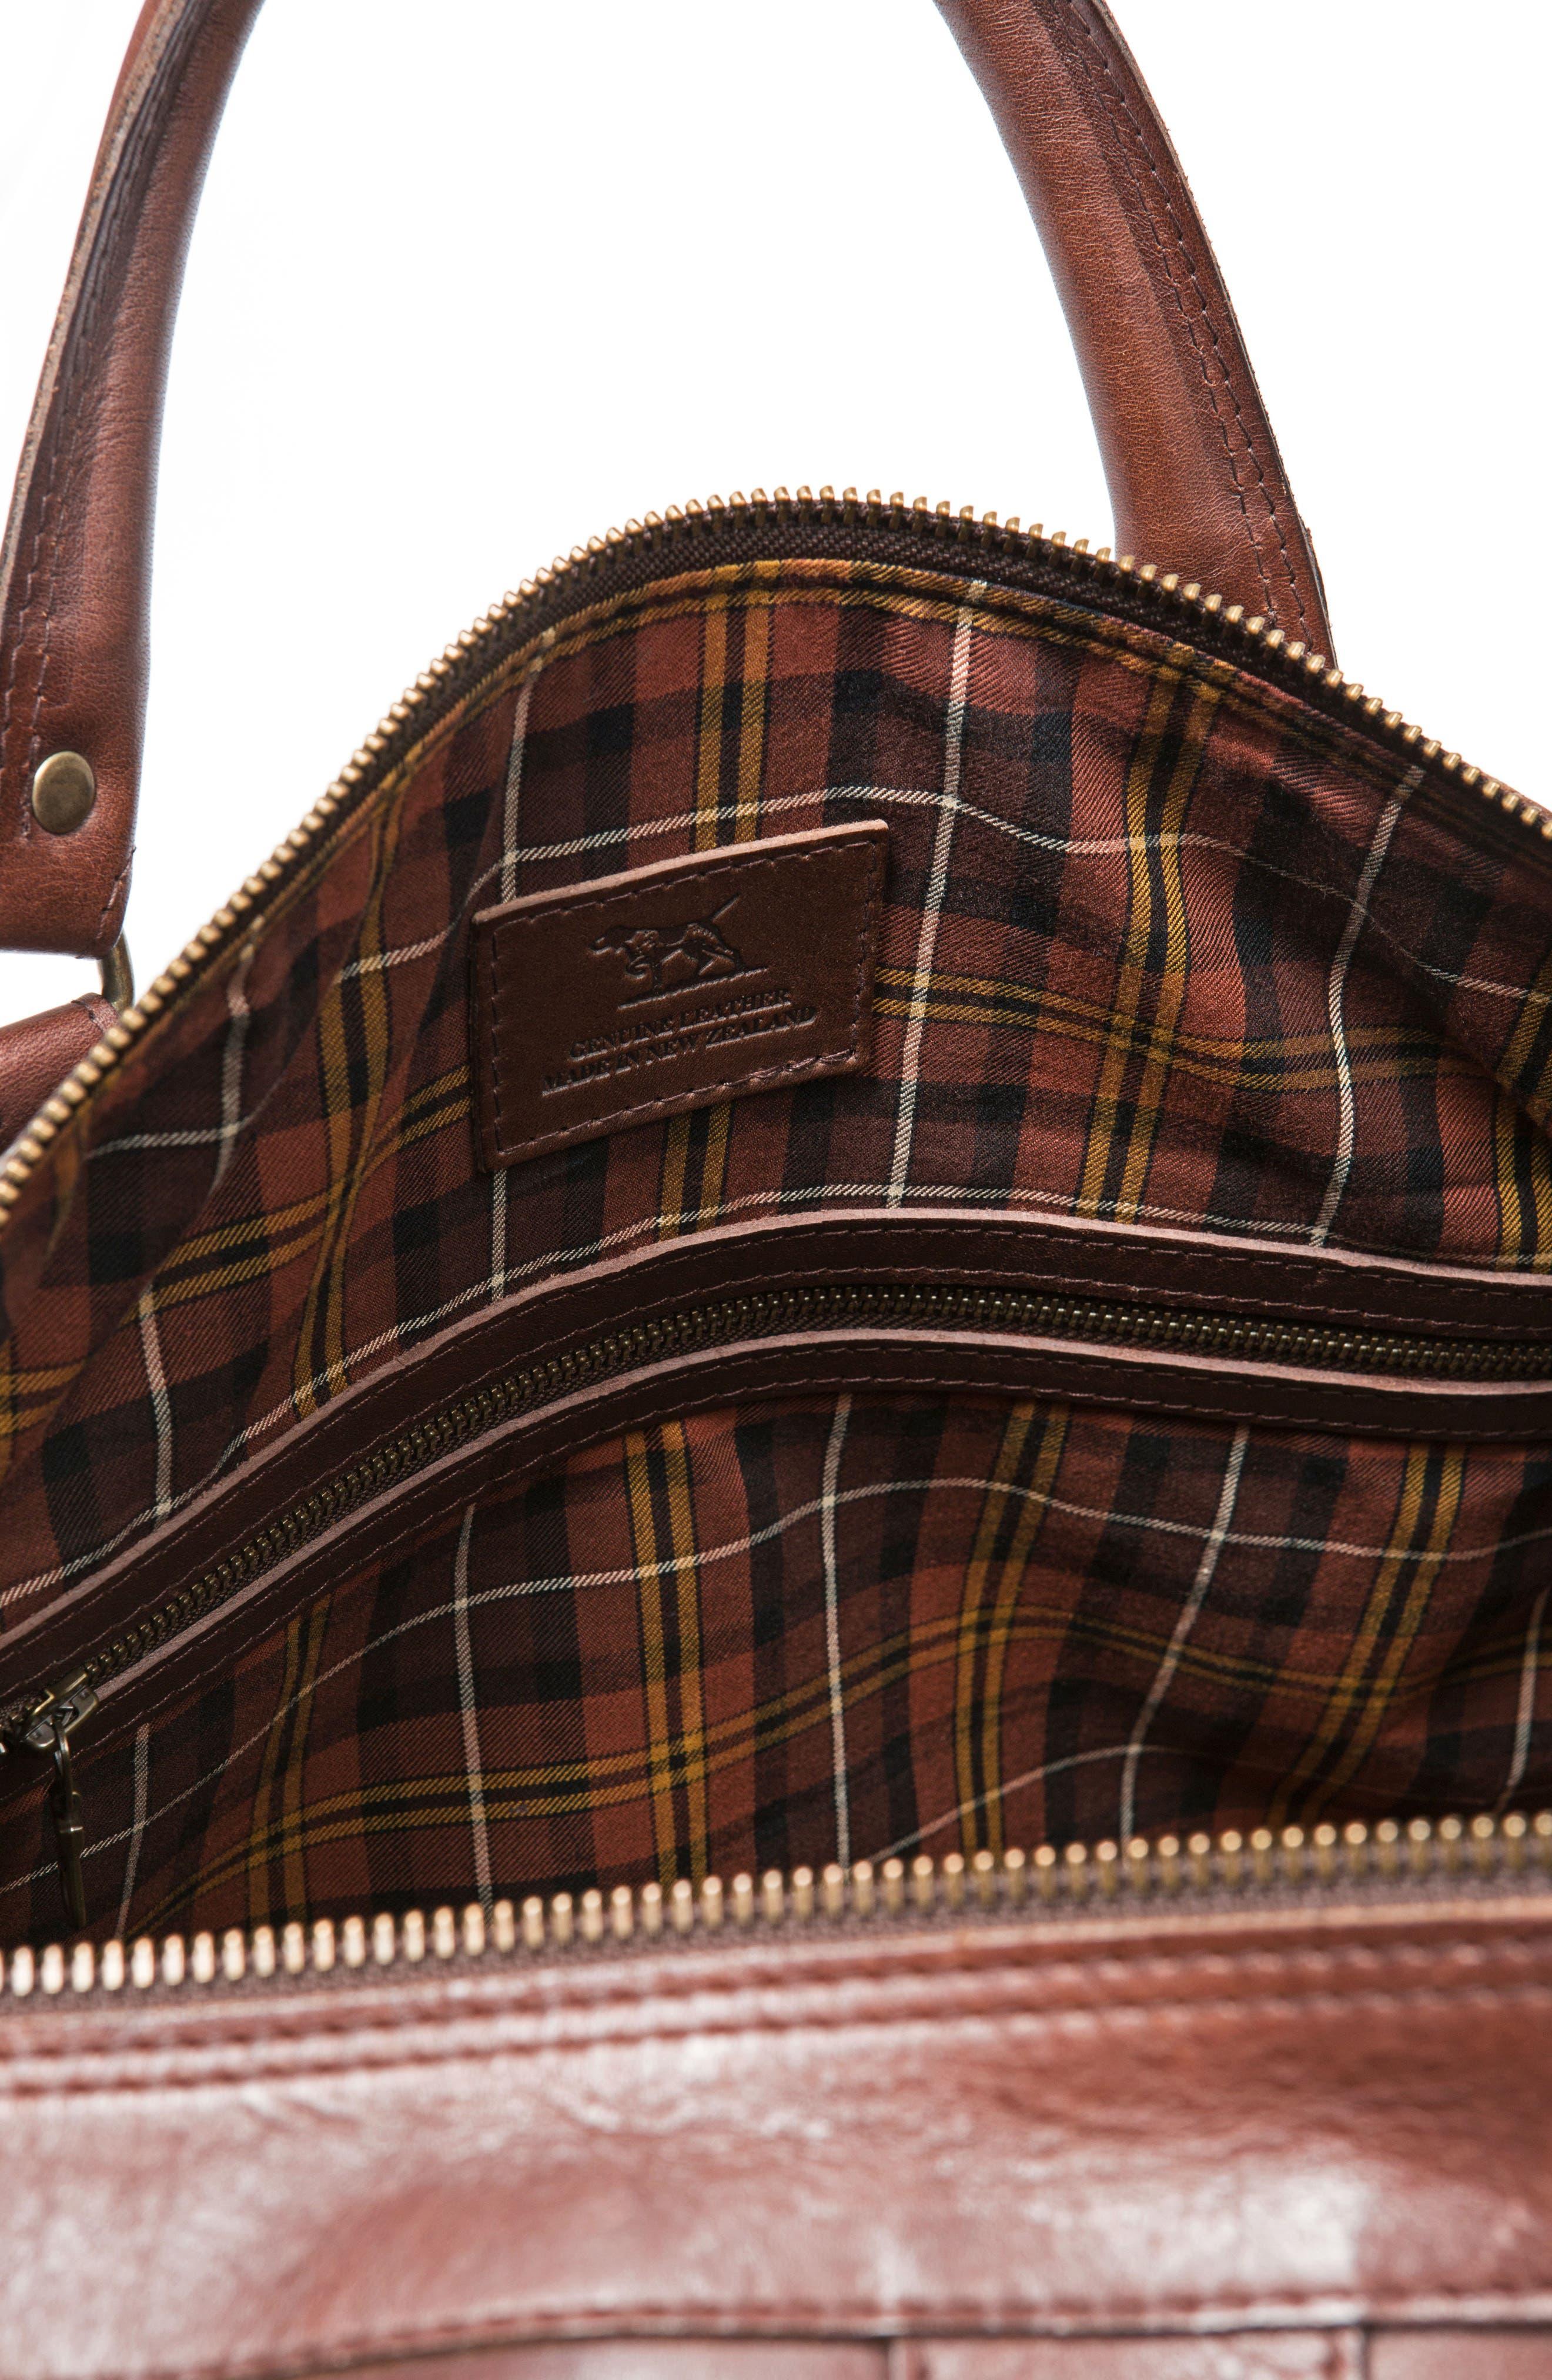 RODD & GUNN,                             Leather Duffel Bag,                             Alternate thumbnail 2, color,                             216